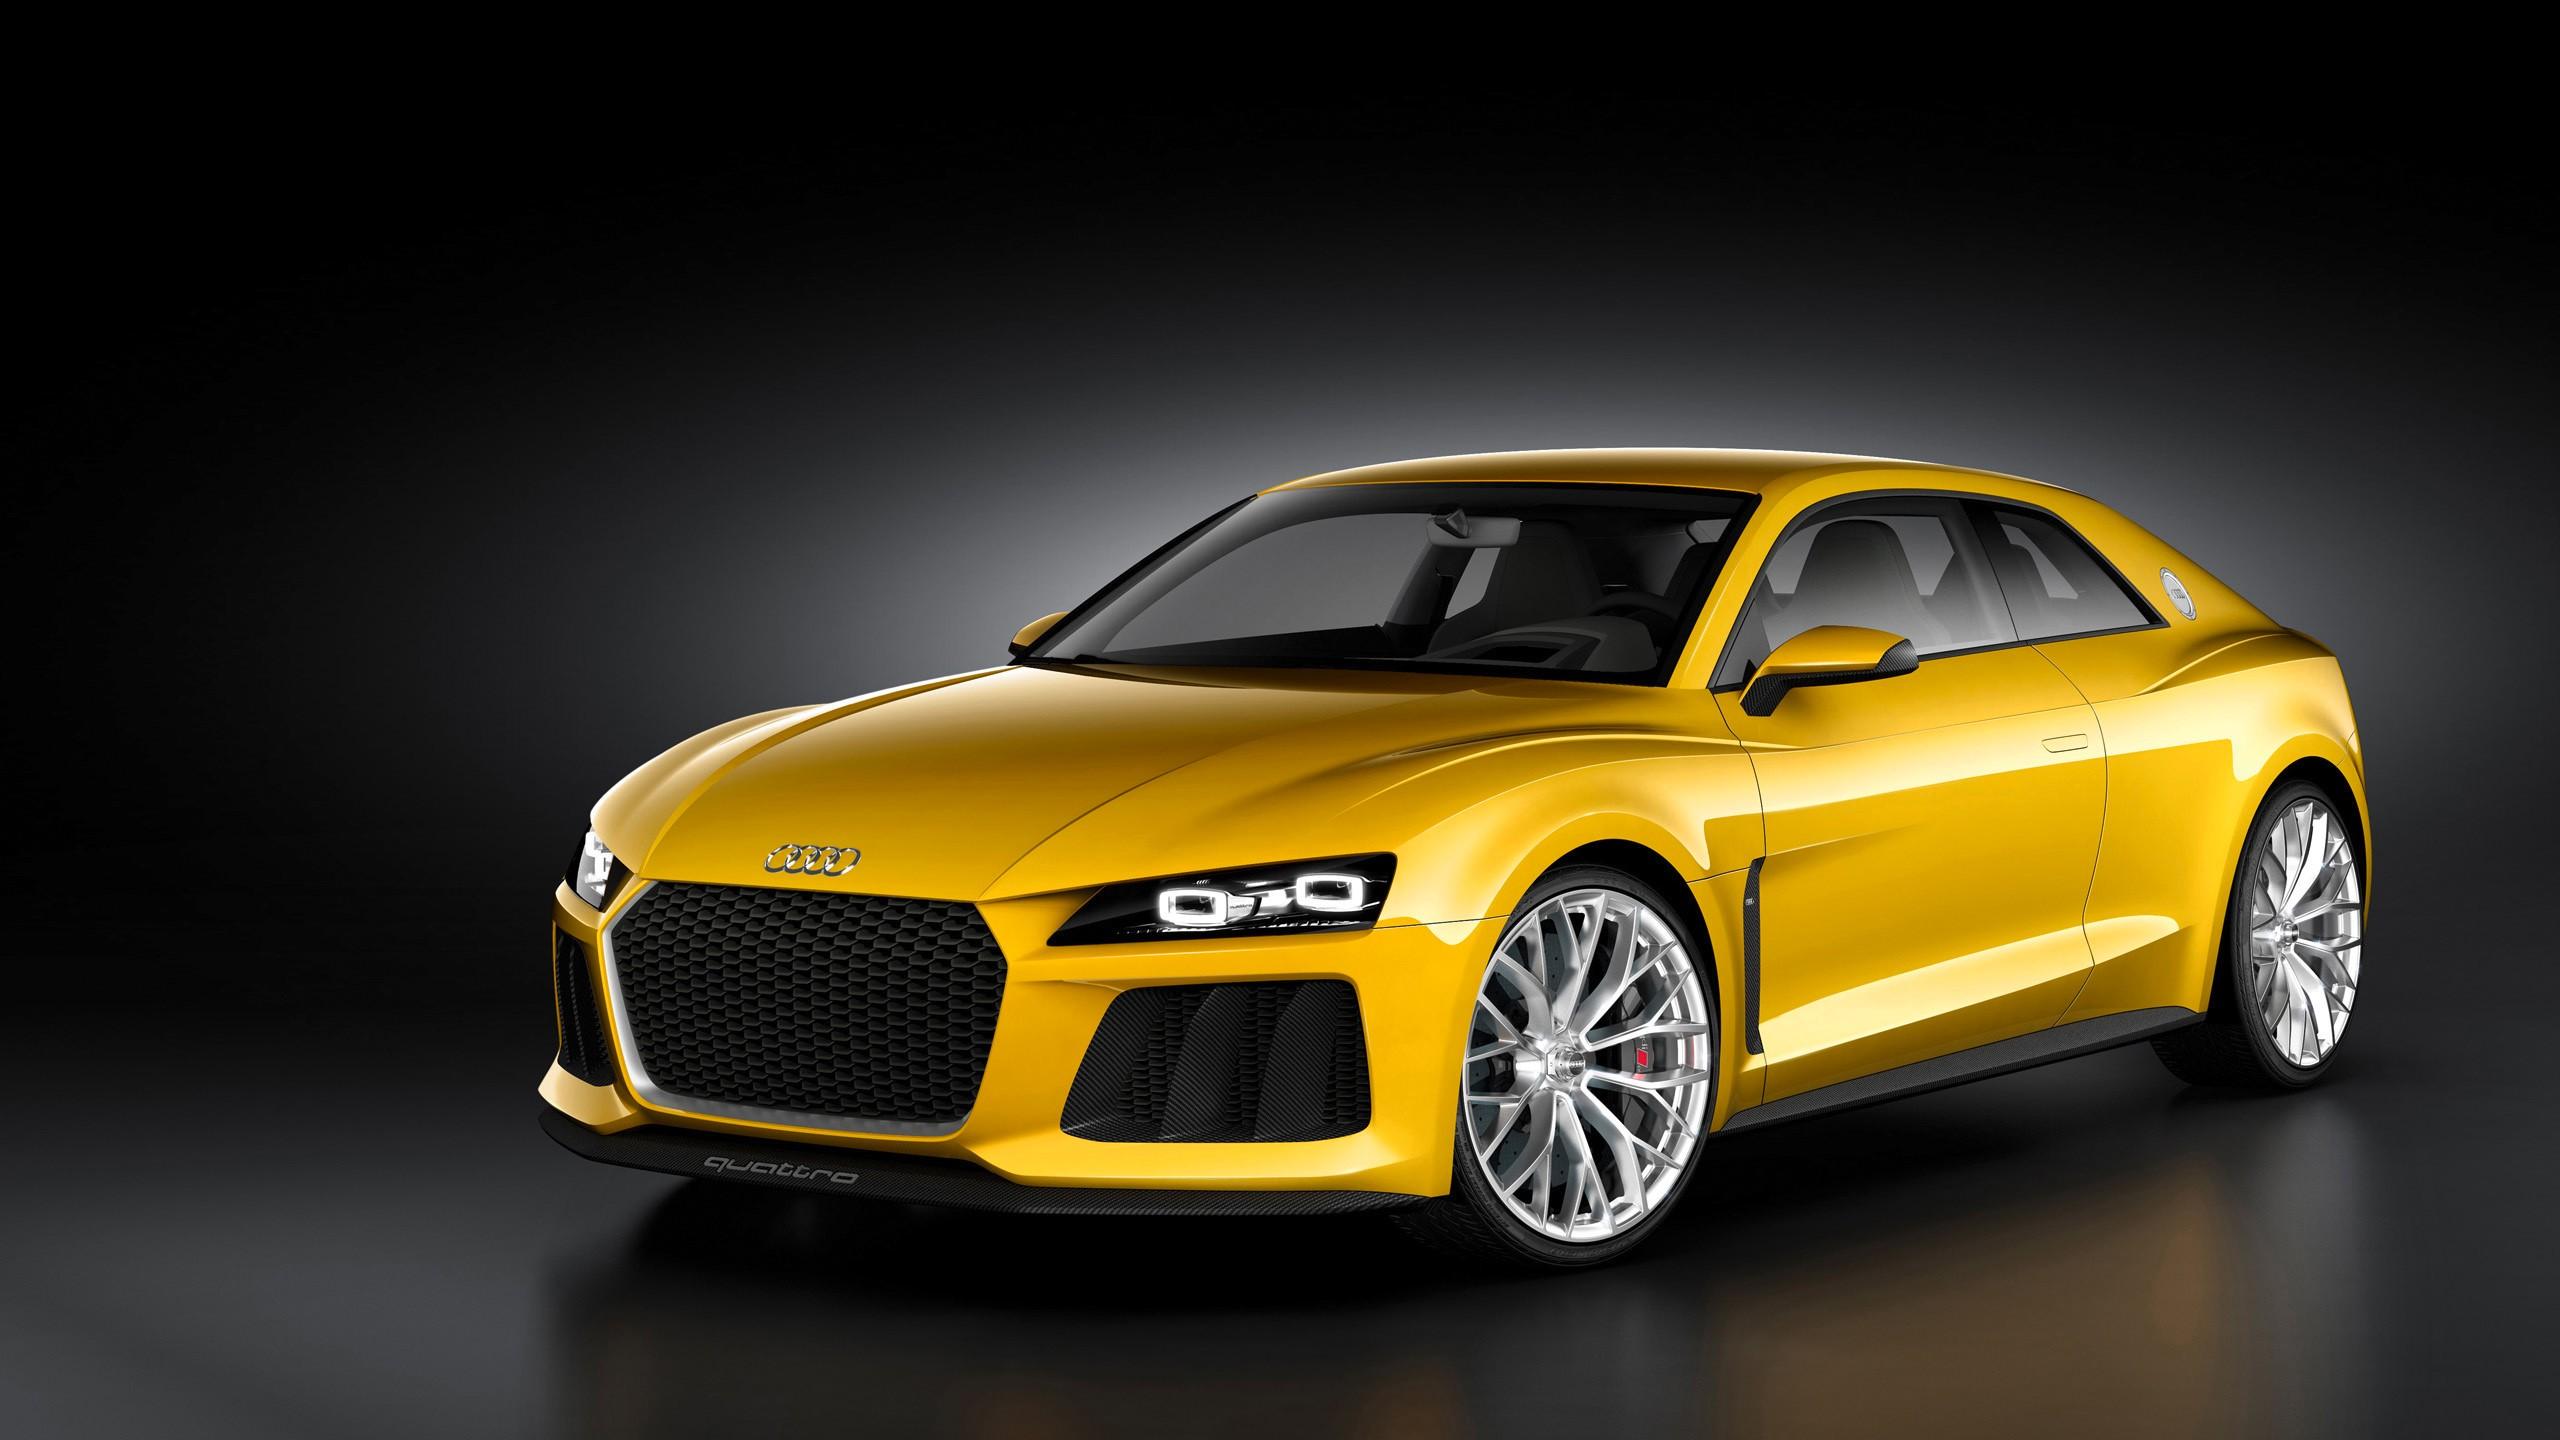 High Quality ... X 1440 Original. Tags: Concept Audi Quattro Sport 2013